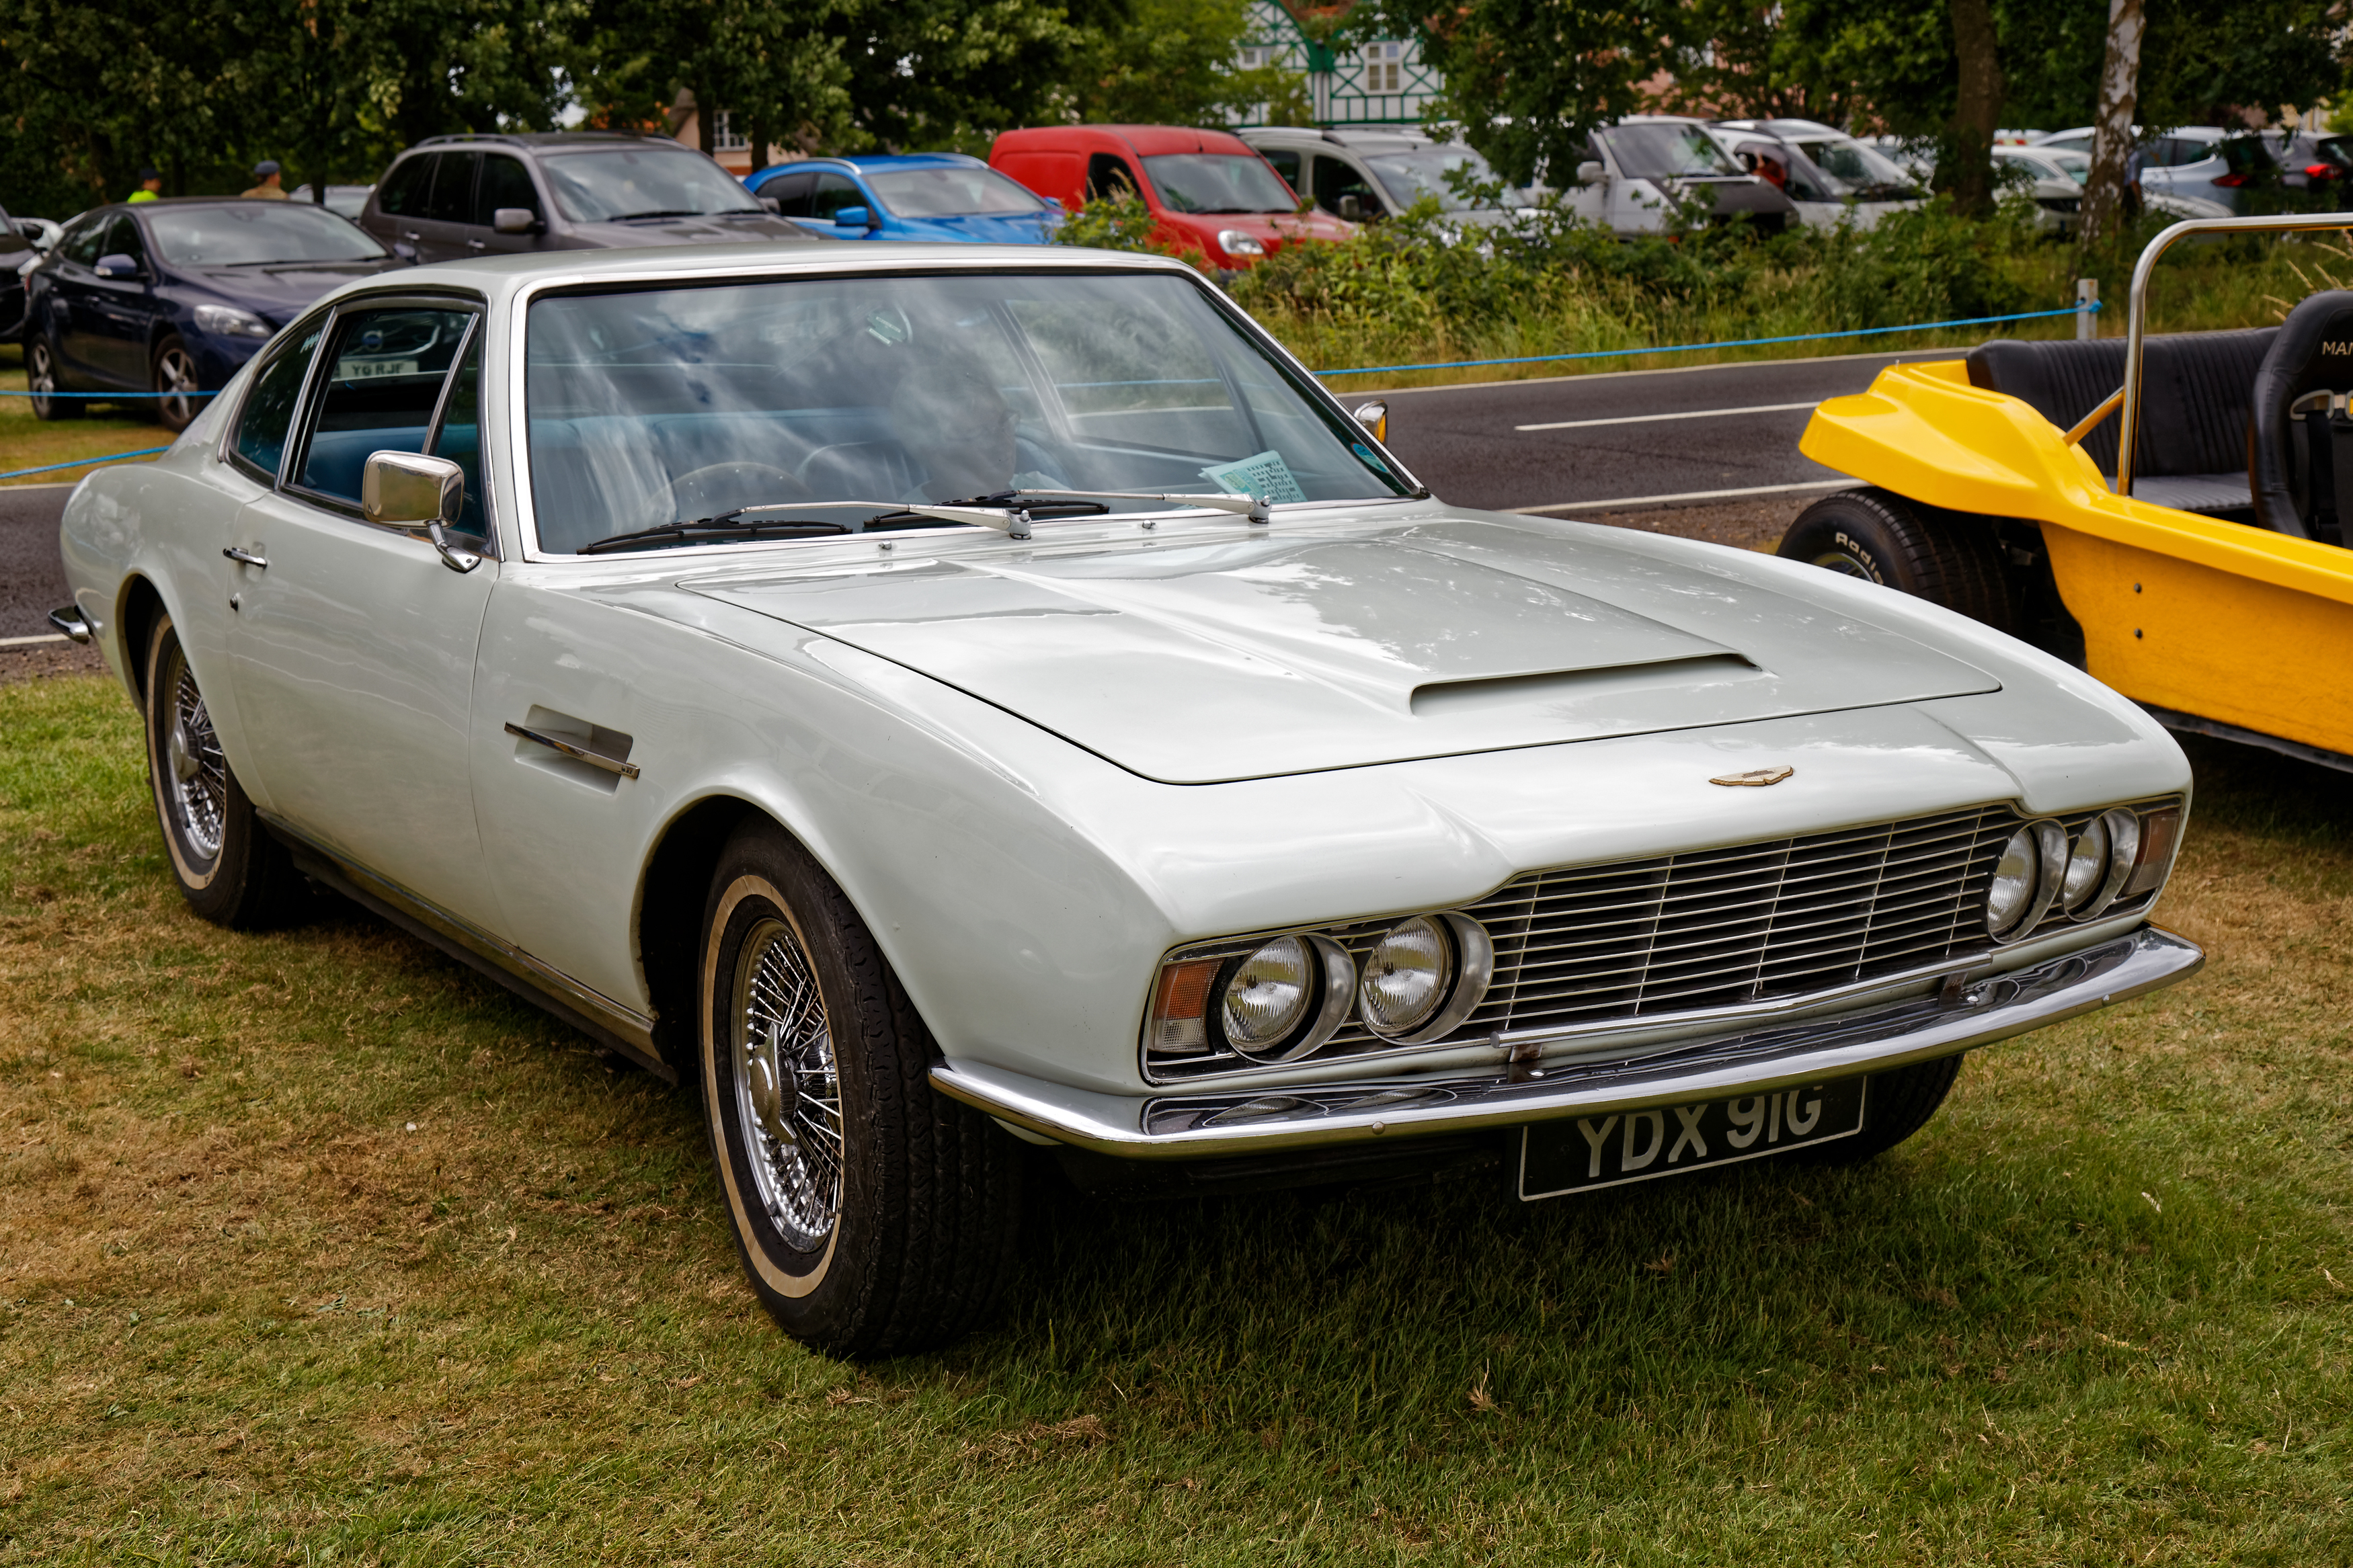 file:1968 aston martin dbs coupé at hatfield heath festival 2017